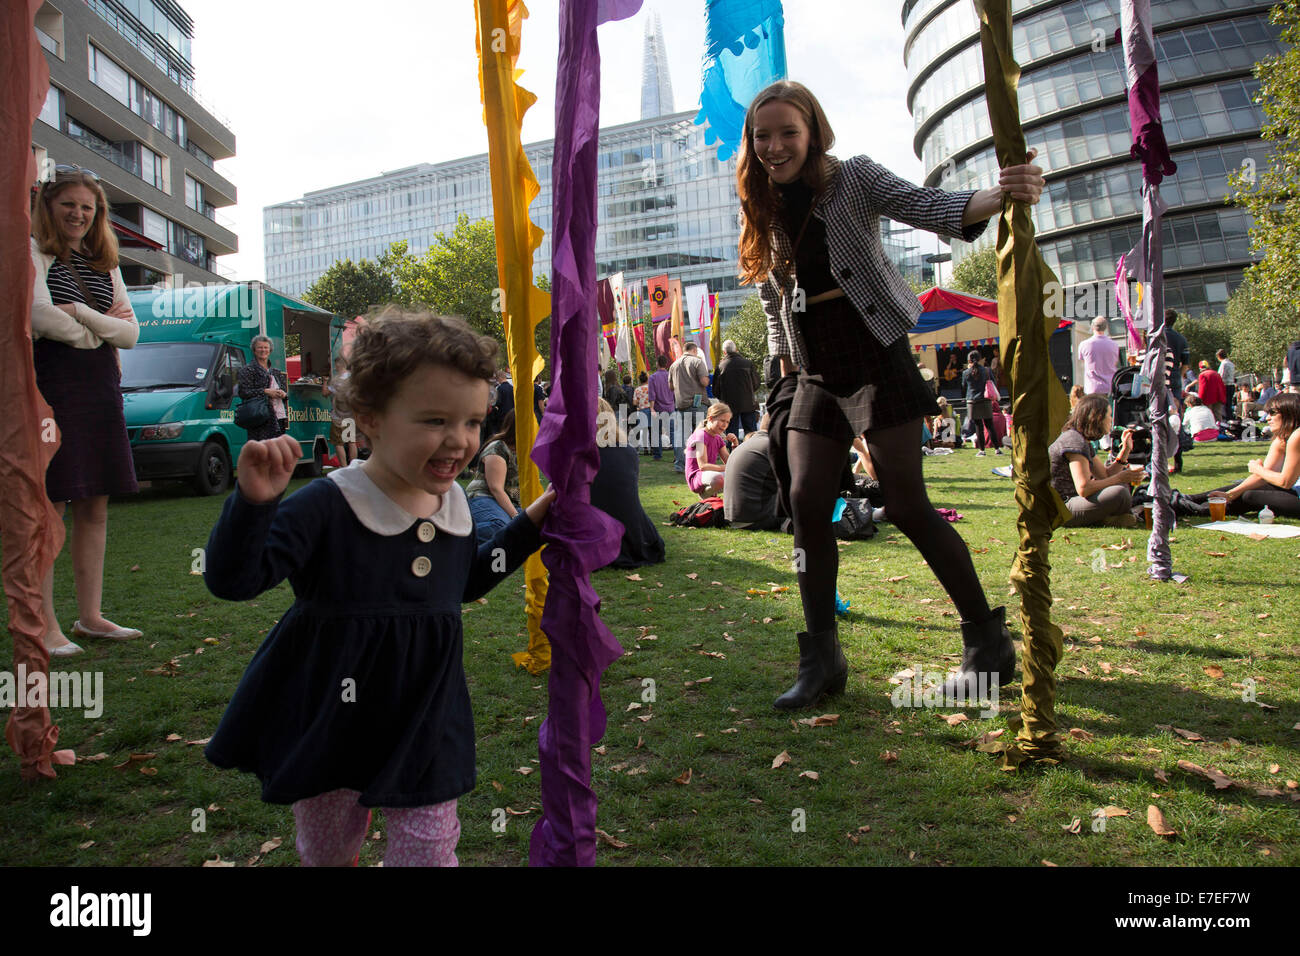 Recolha de pessoas hang out, ouvir bandas e outras actividades no Blue Ribbon Village. Thames Festival Londres UK. Imagens de Stock